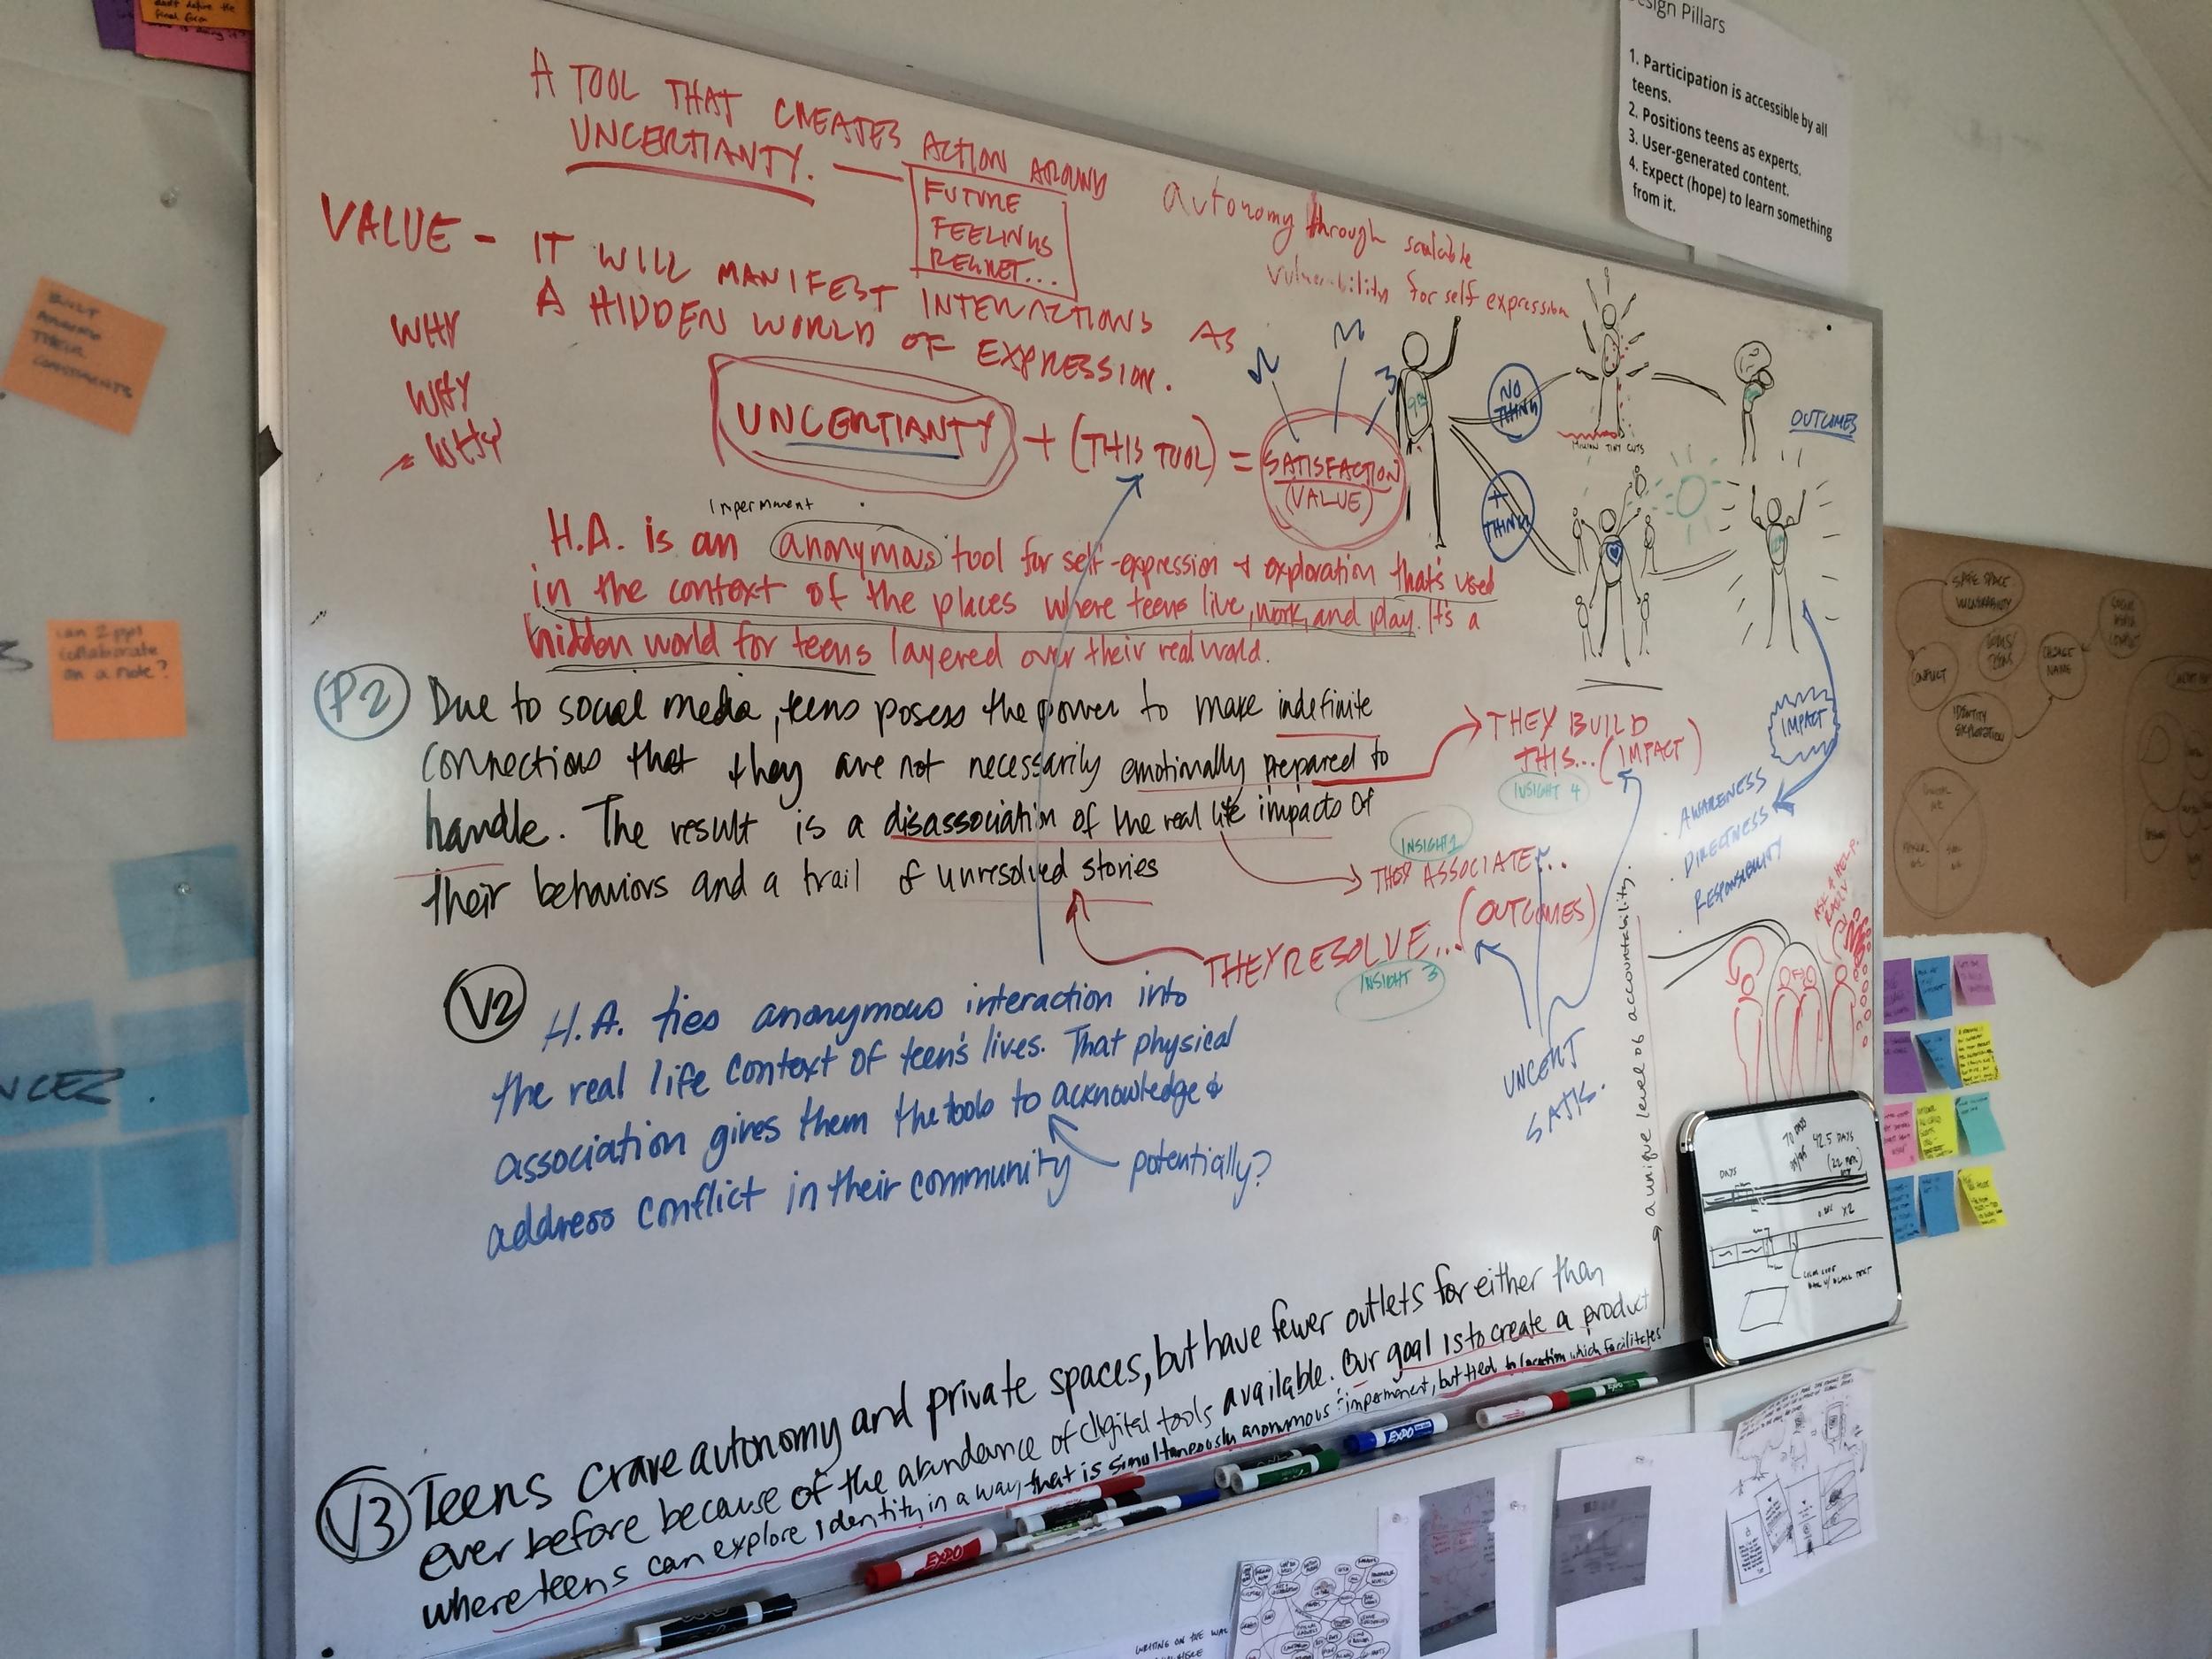 Problem & Value Statement Exploration